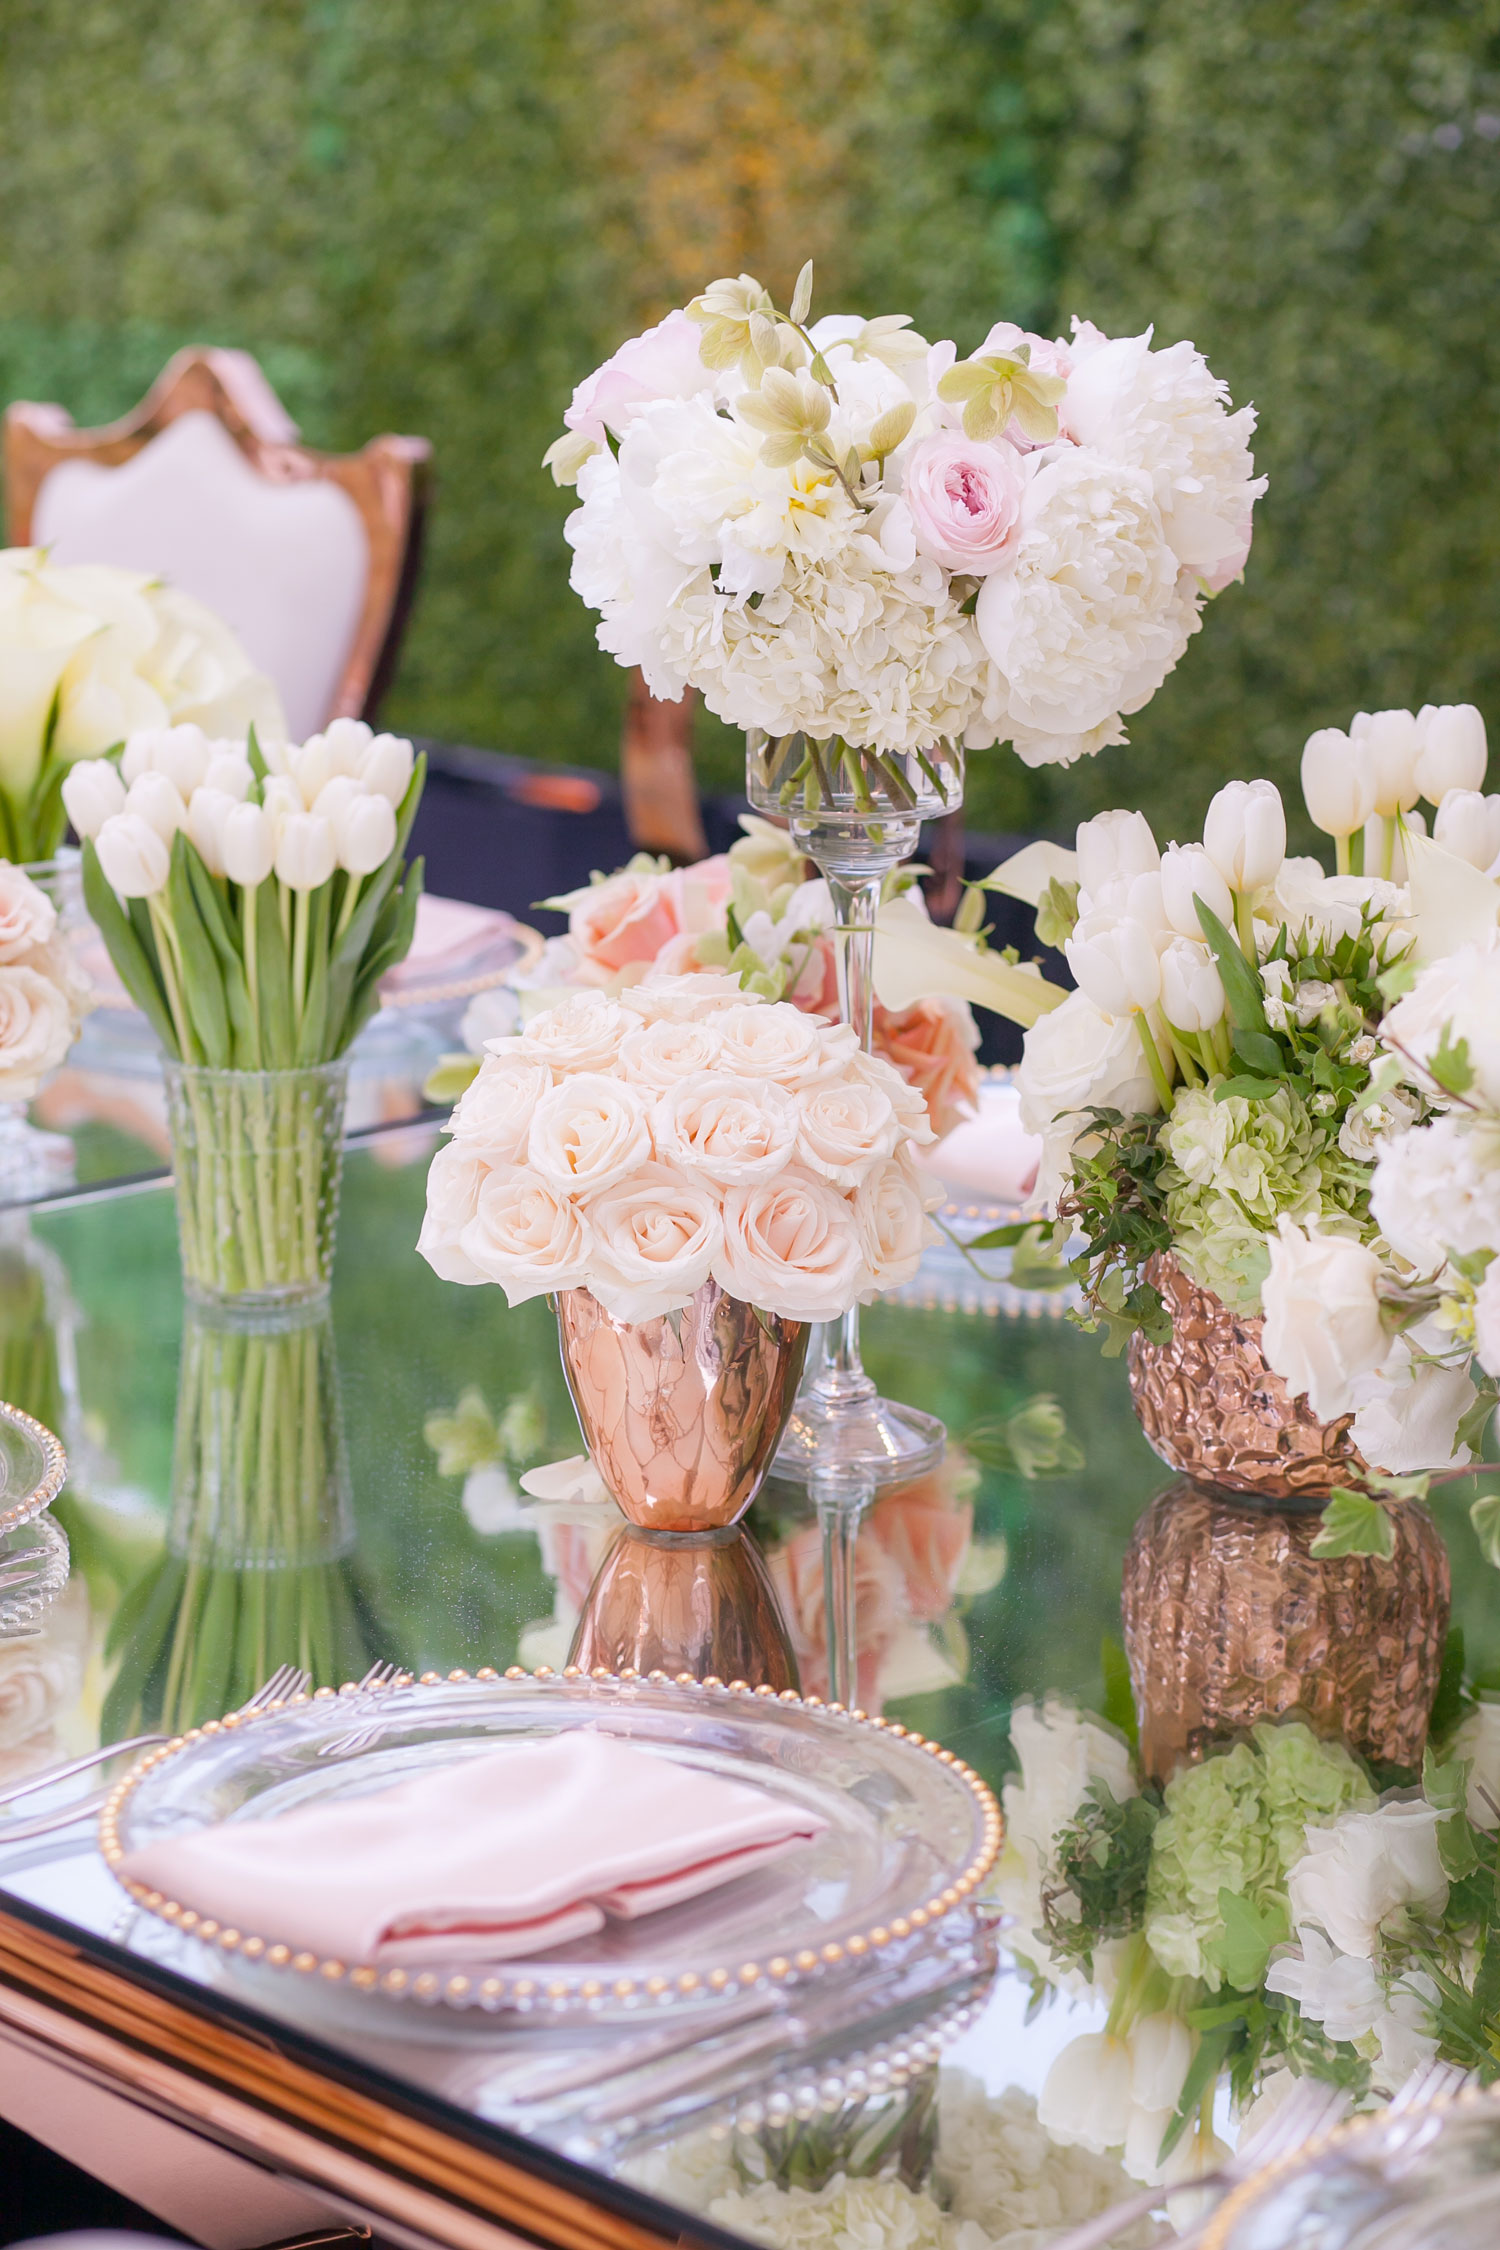 Mirror wedding reception table no linen tablecloth flower centerpieces